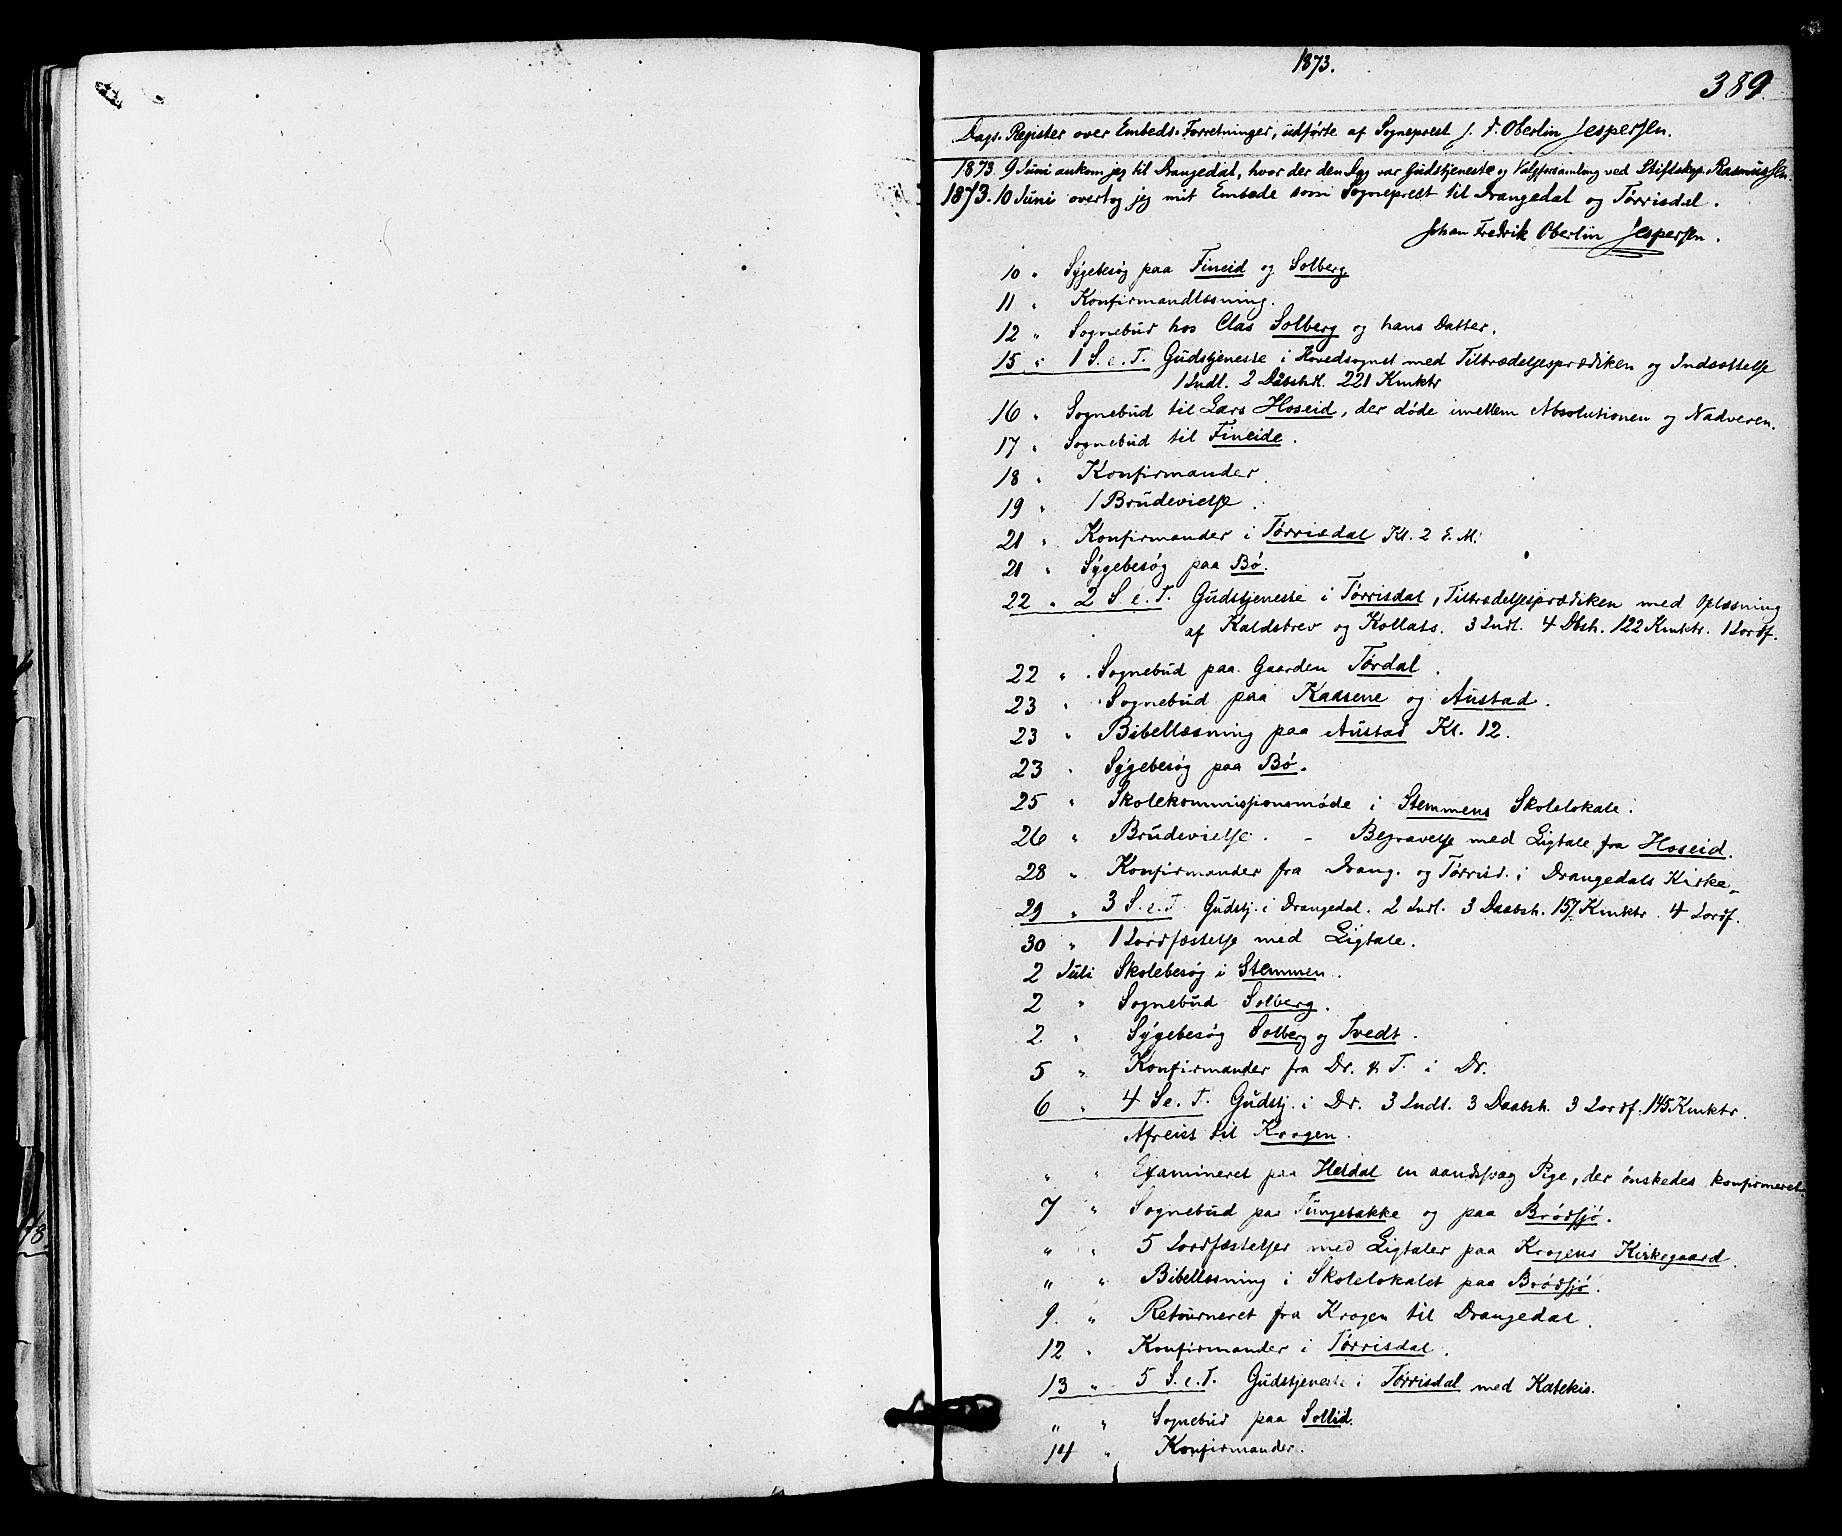 SAKO, Drangedal kirkebøker, F/Fa/L0009: Ministerialbok nr. 9 /1, 1872-1884, s. 389